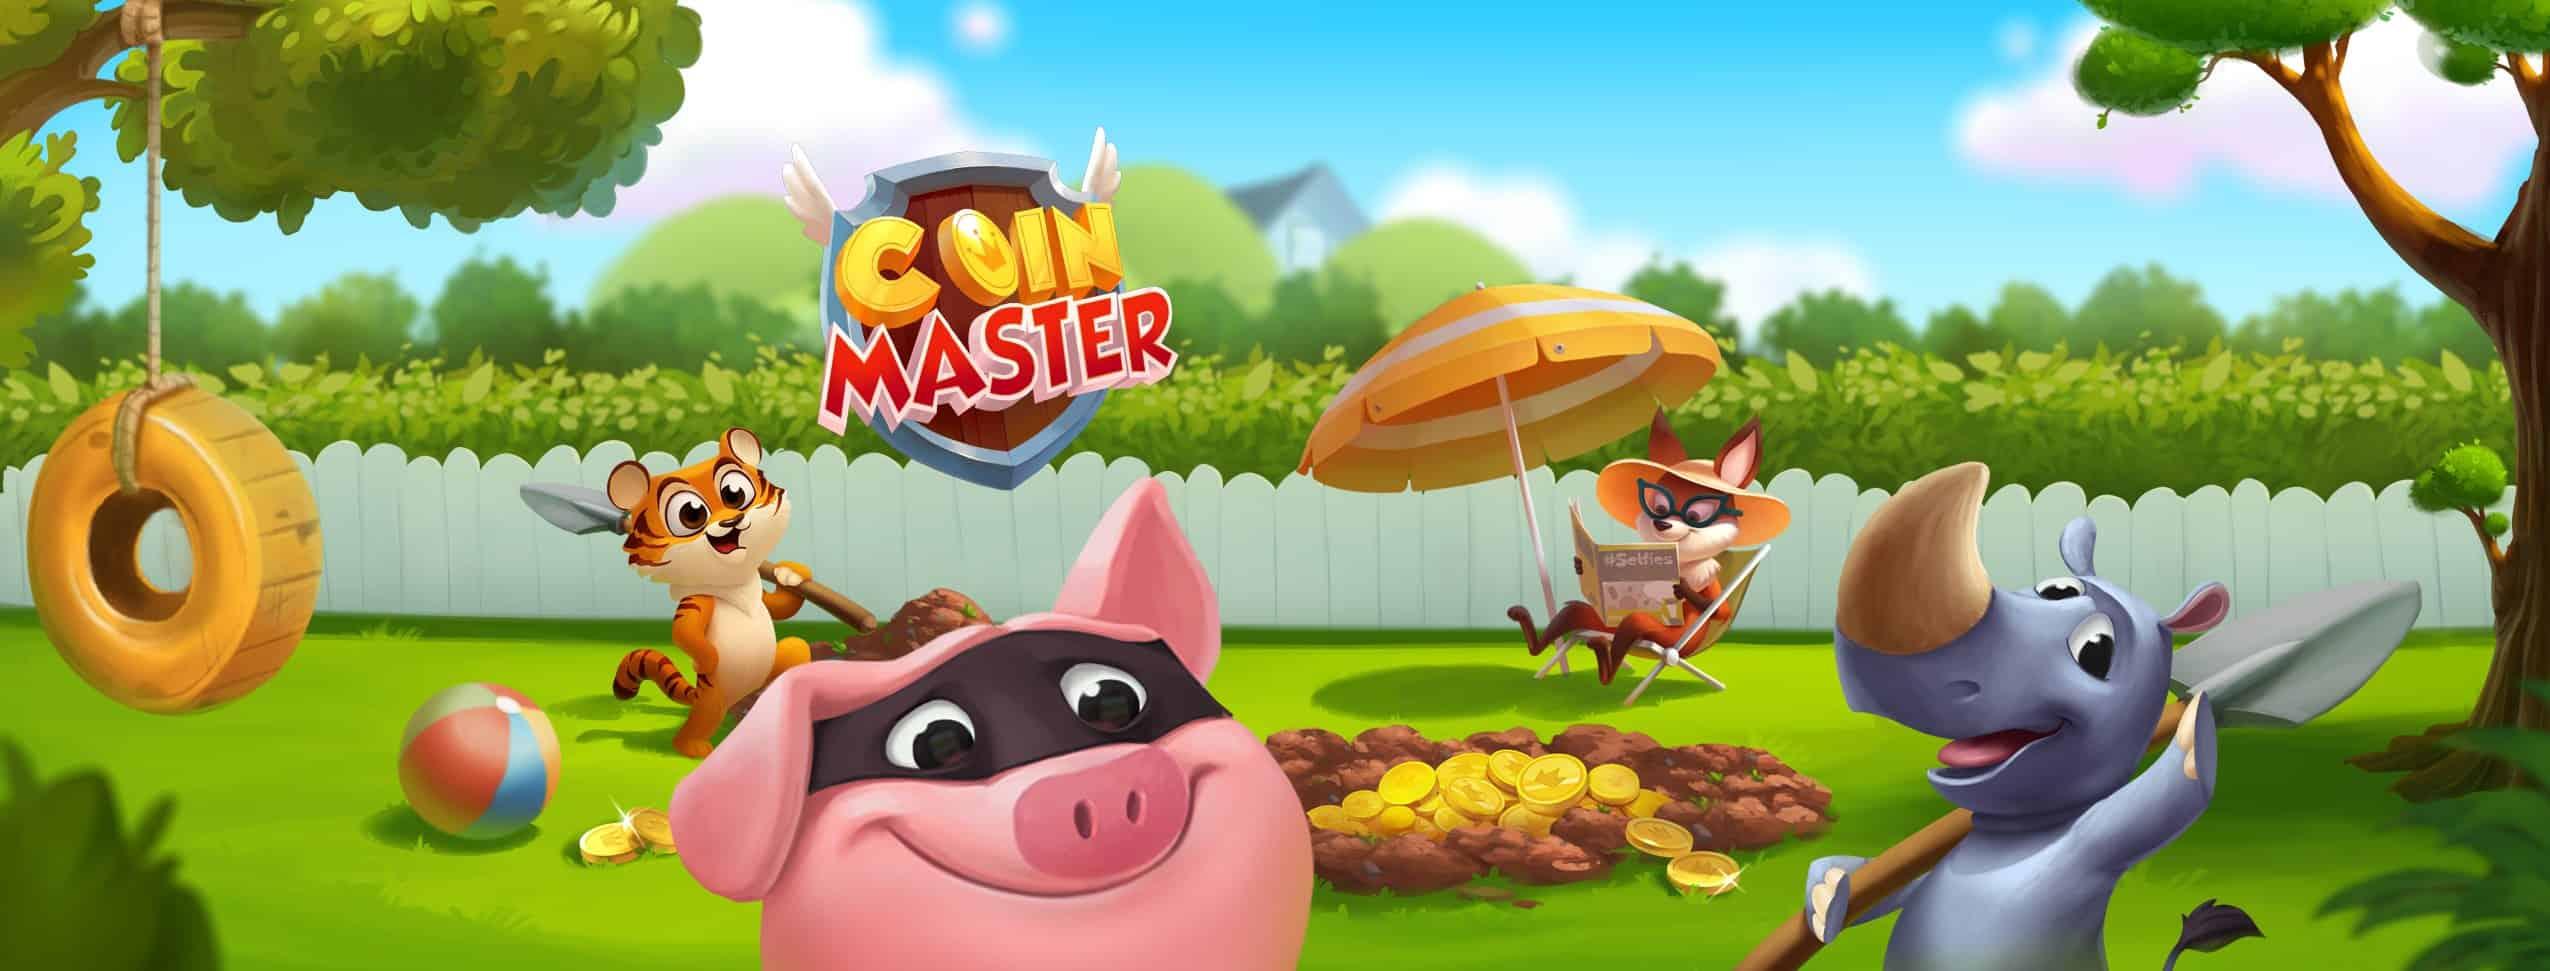 Enlaces con Tiradas gratis del Coin Master 2021